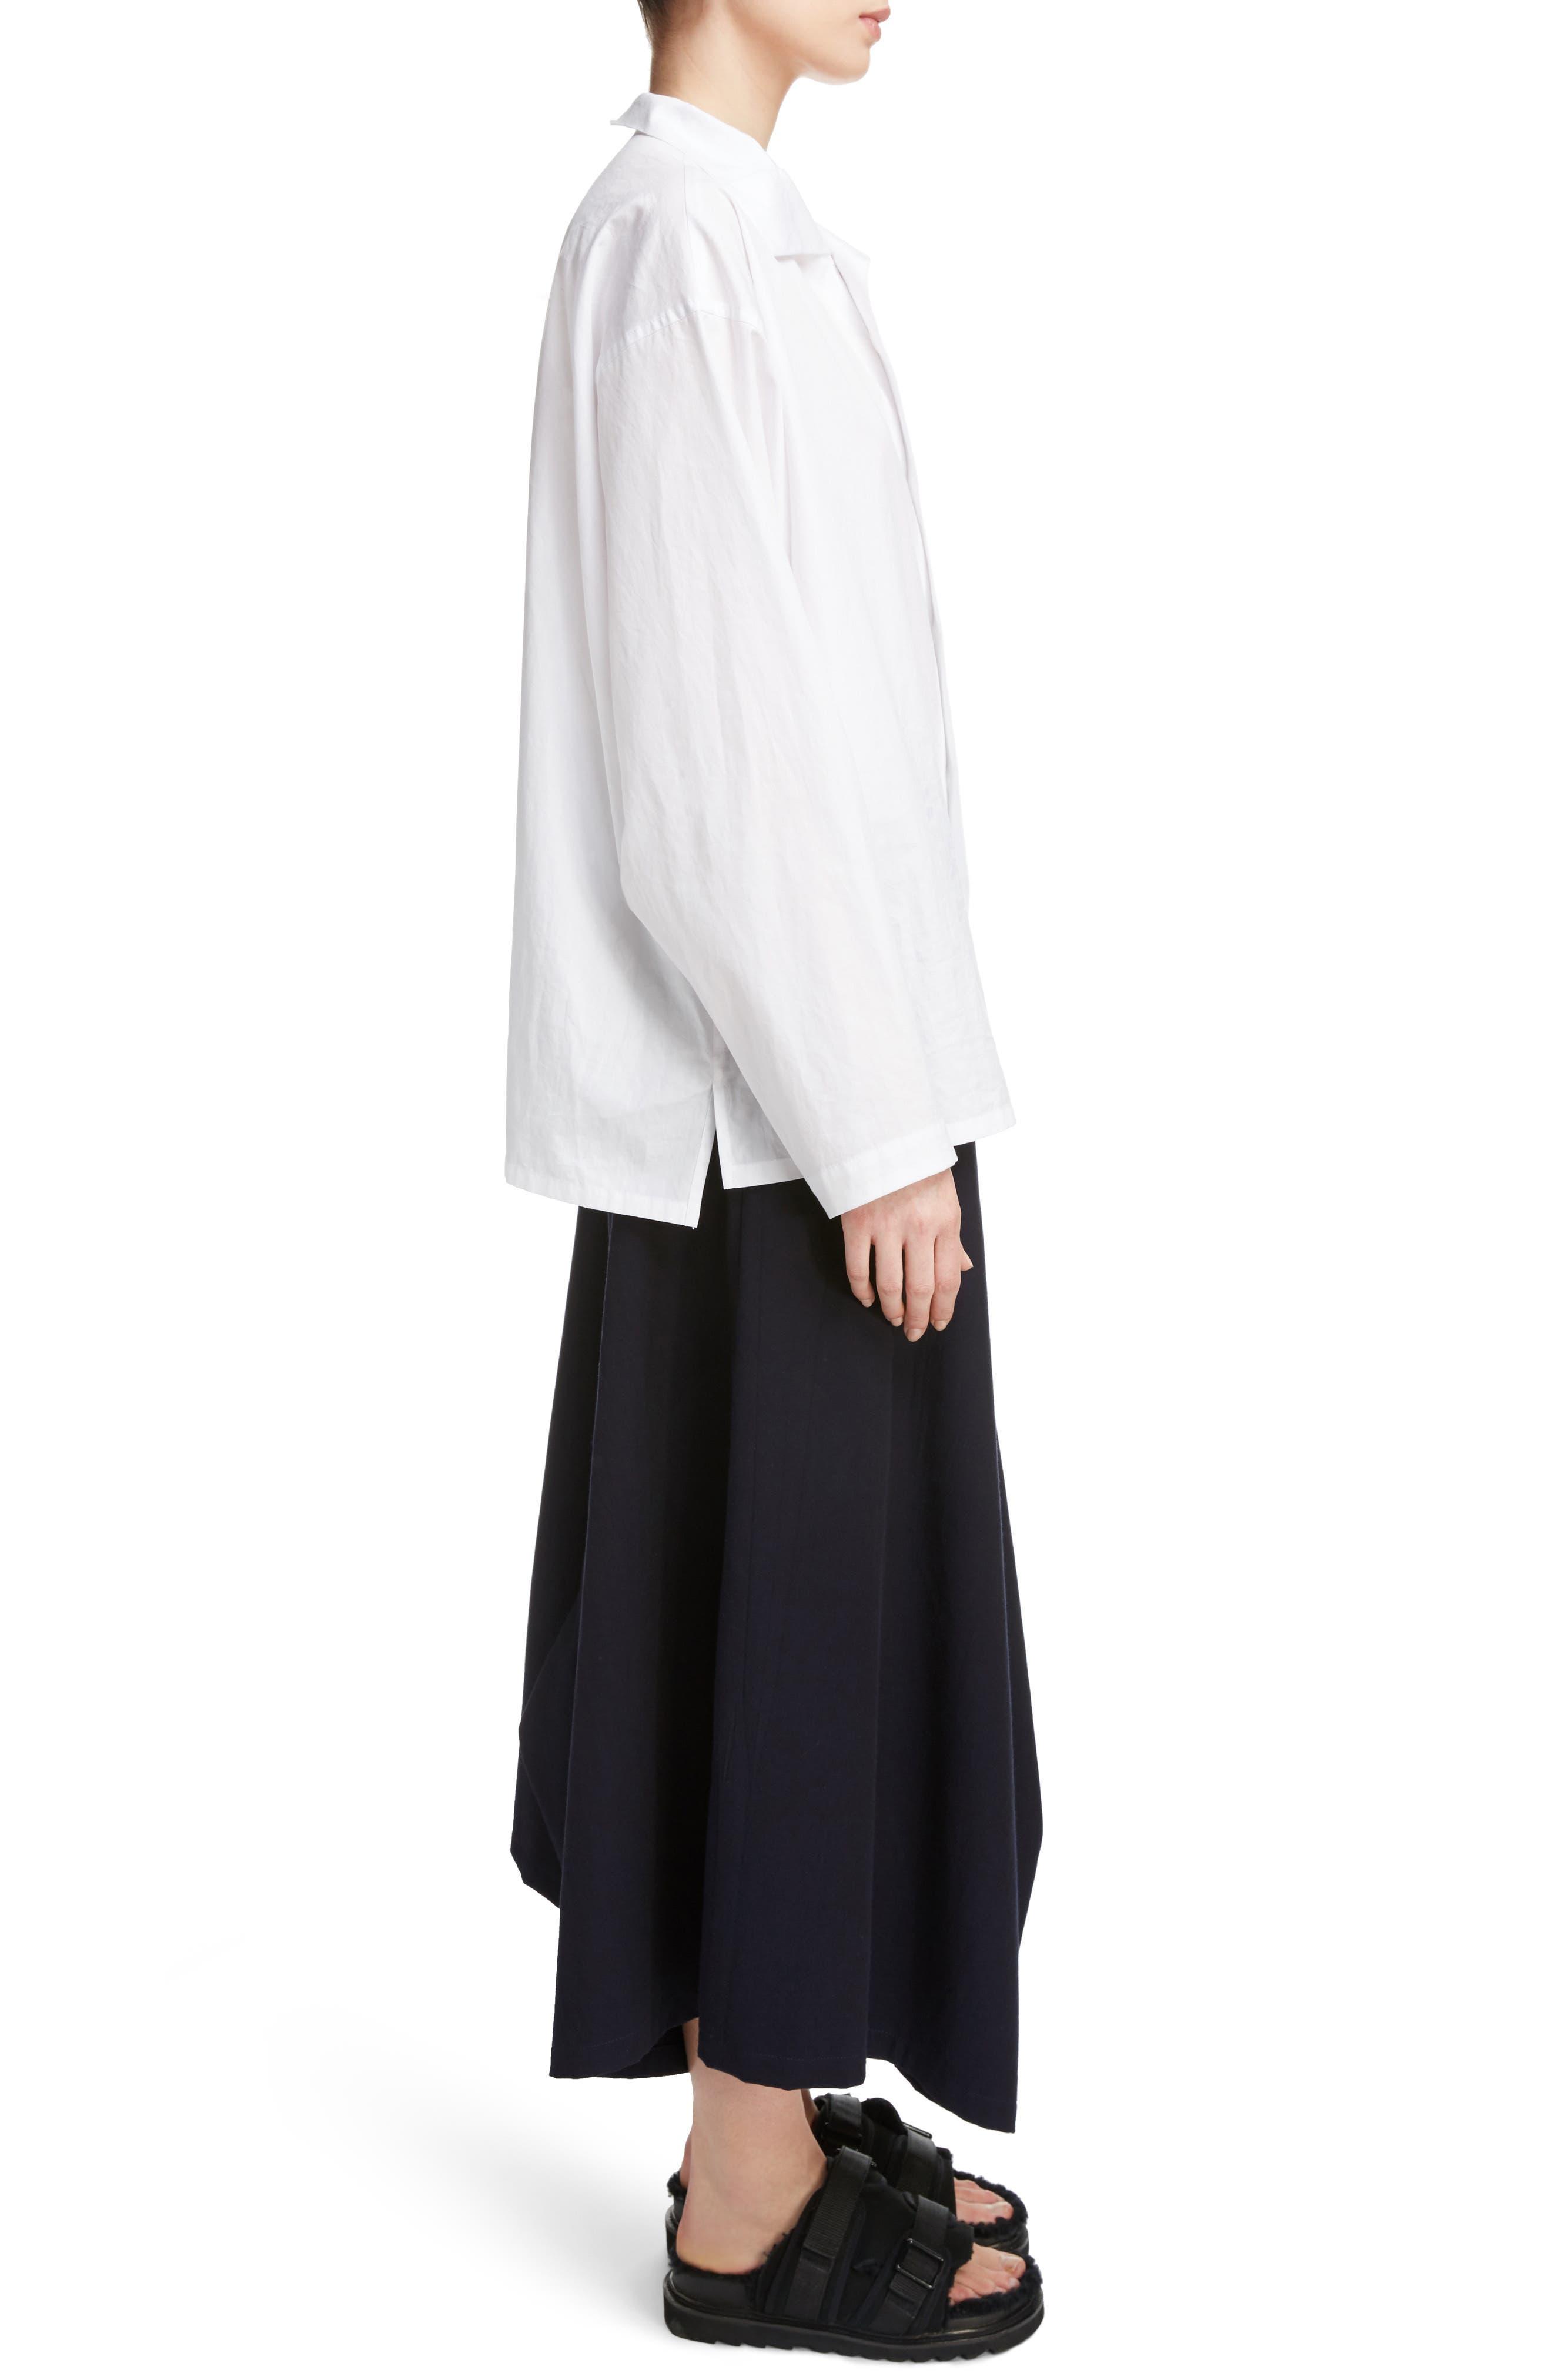 Alternate Image 3  - Y's by Yohji Yamamoto Asymmetrical Collar Blouse